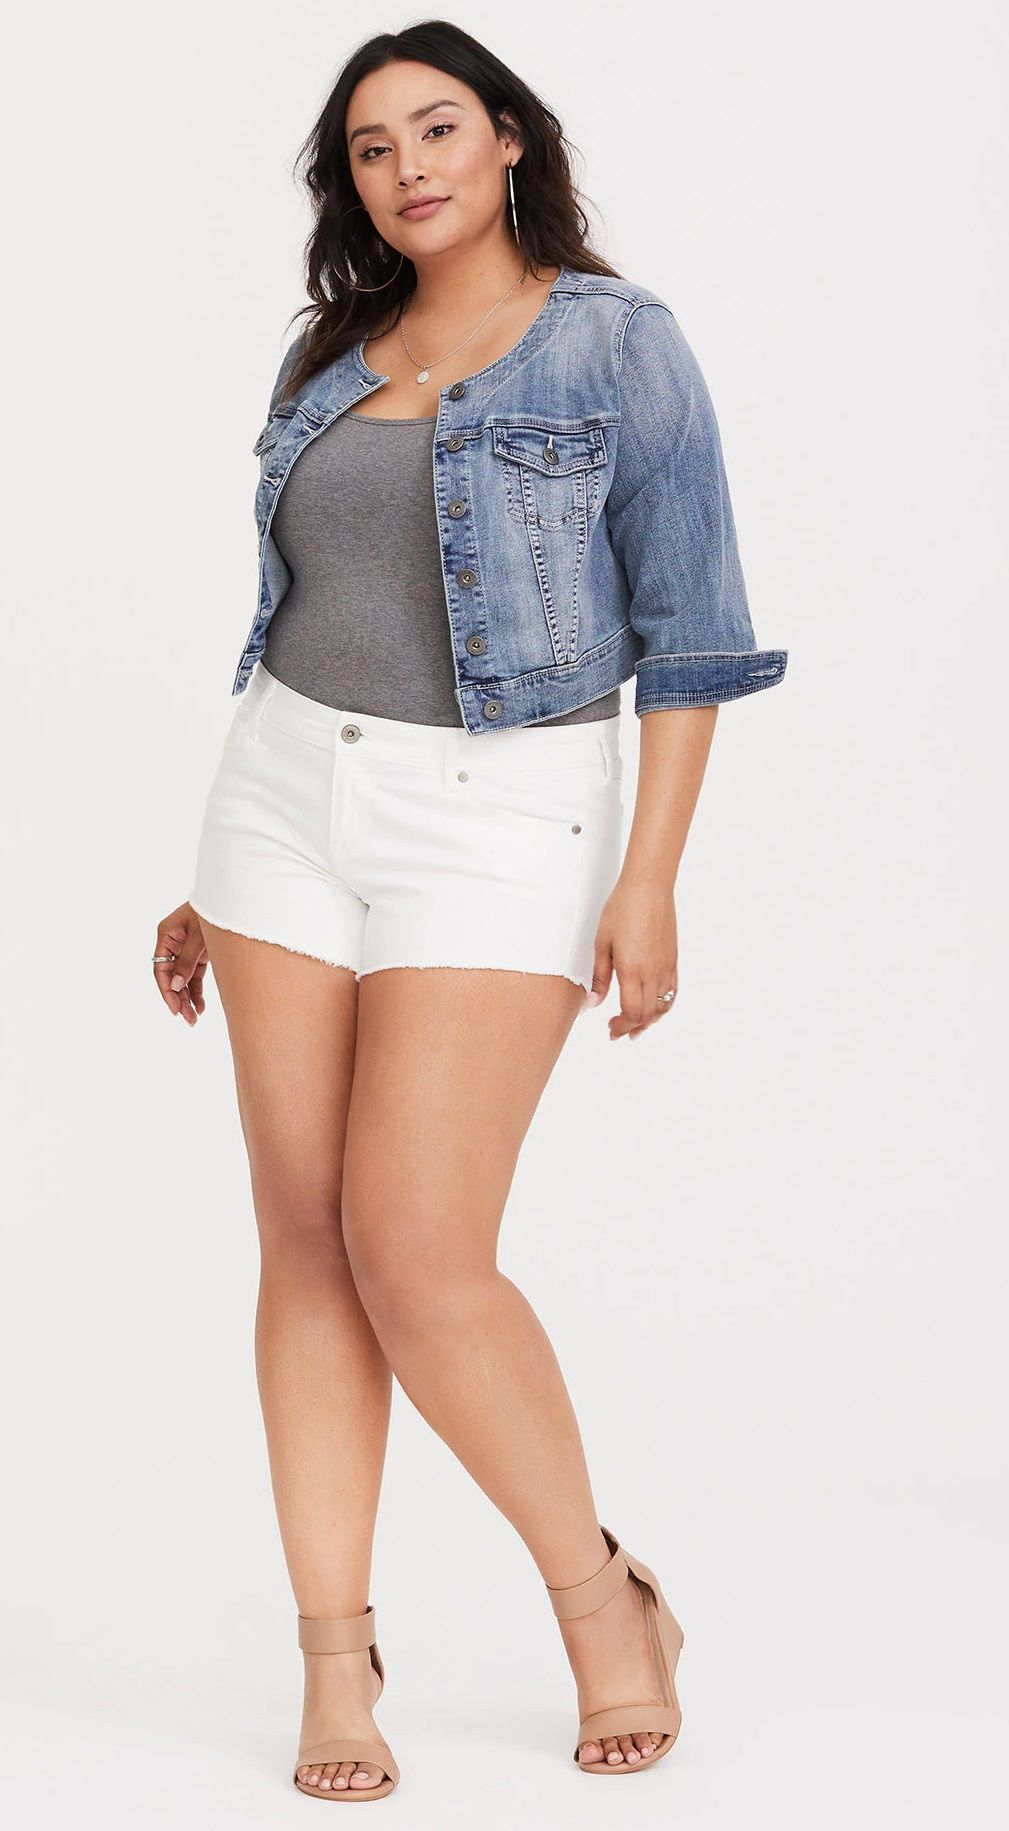 80dfed11b3f Plus Size White Shorts Full Figure Fashion